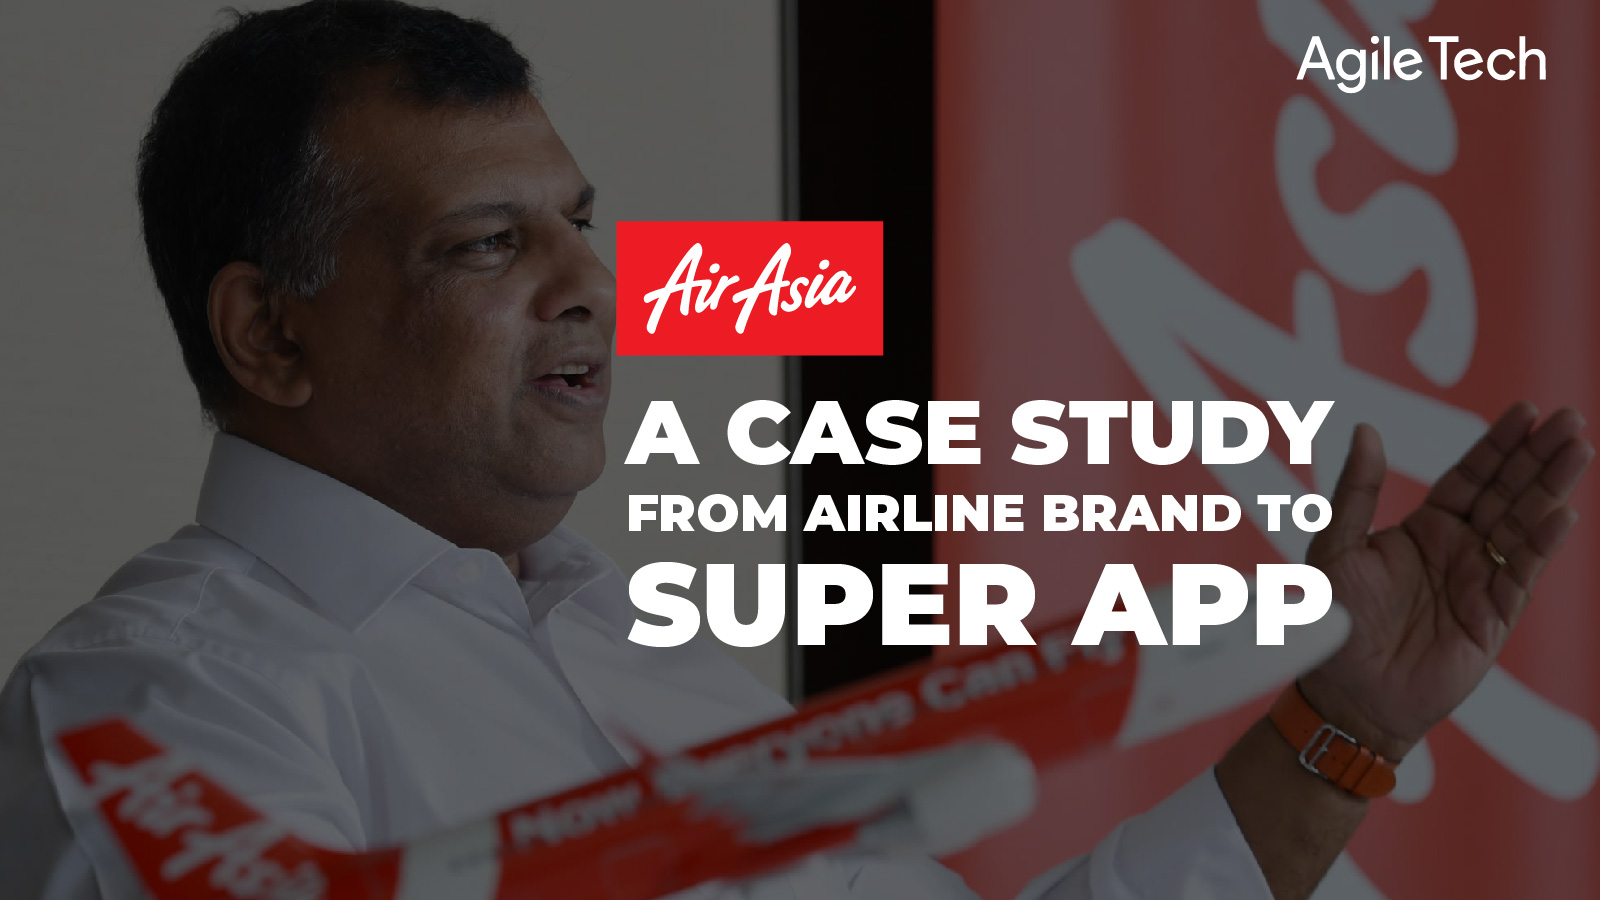 airasia.com super app, asean supera app for everyone, Tony Fernandes is building a super app to counter grab and gojek